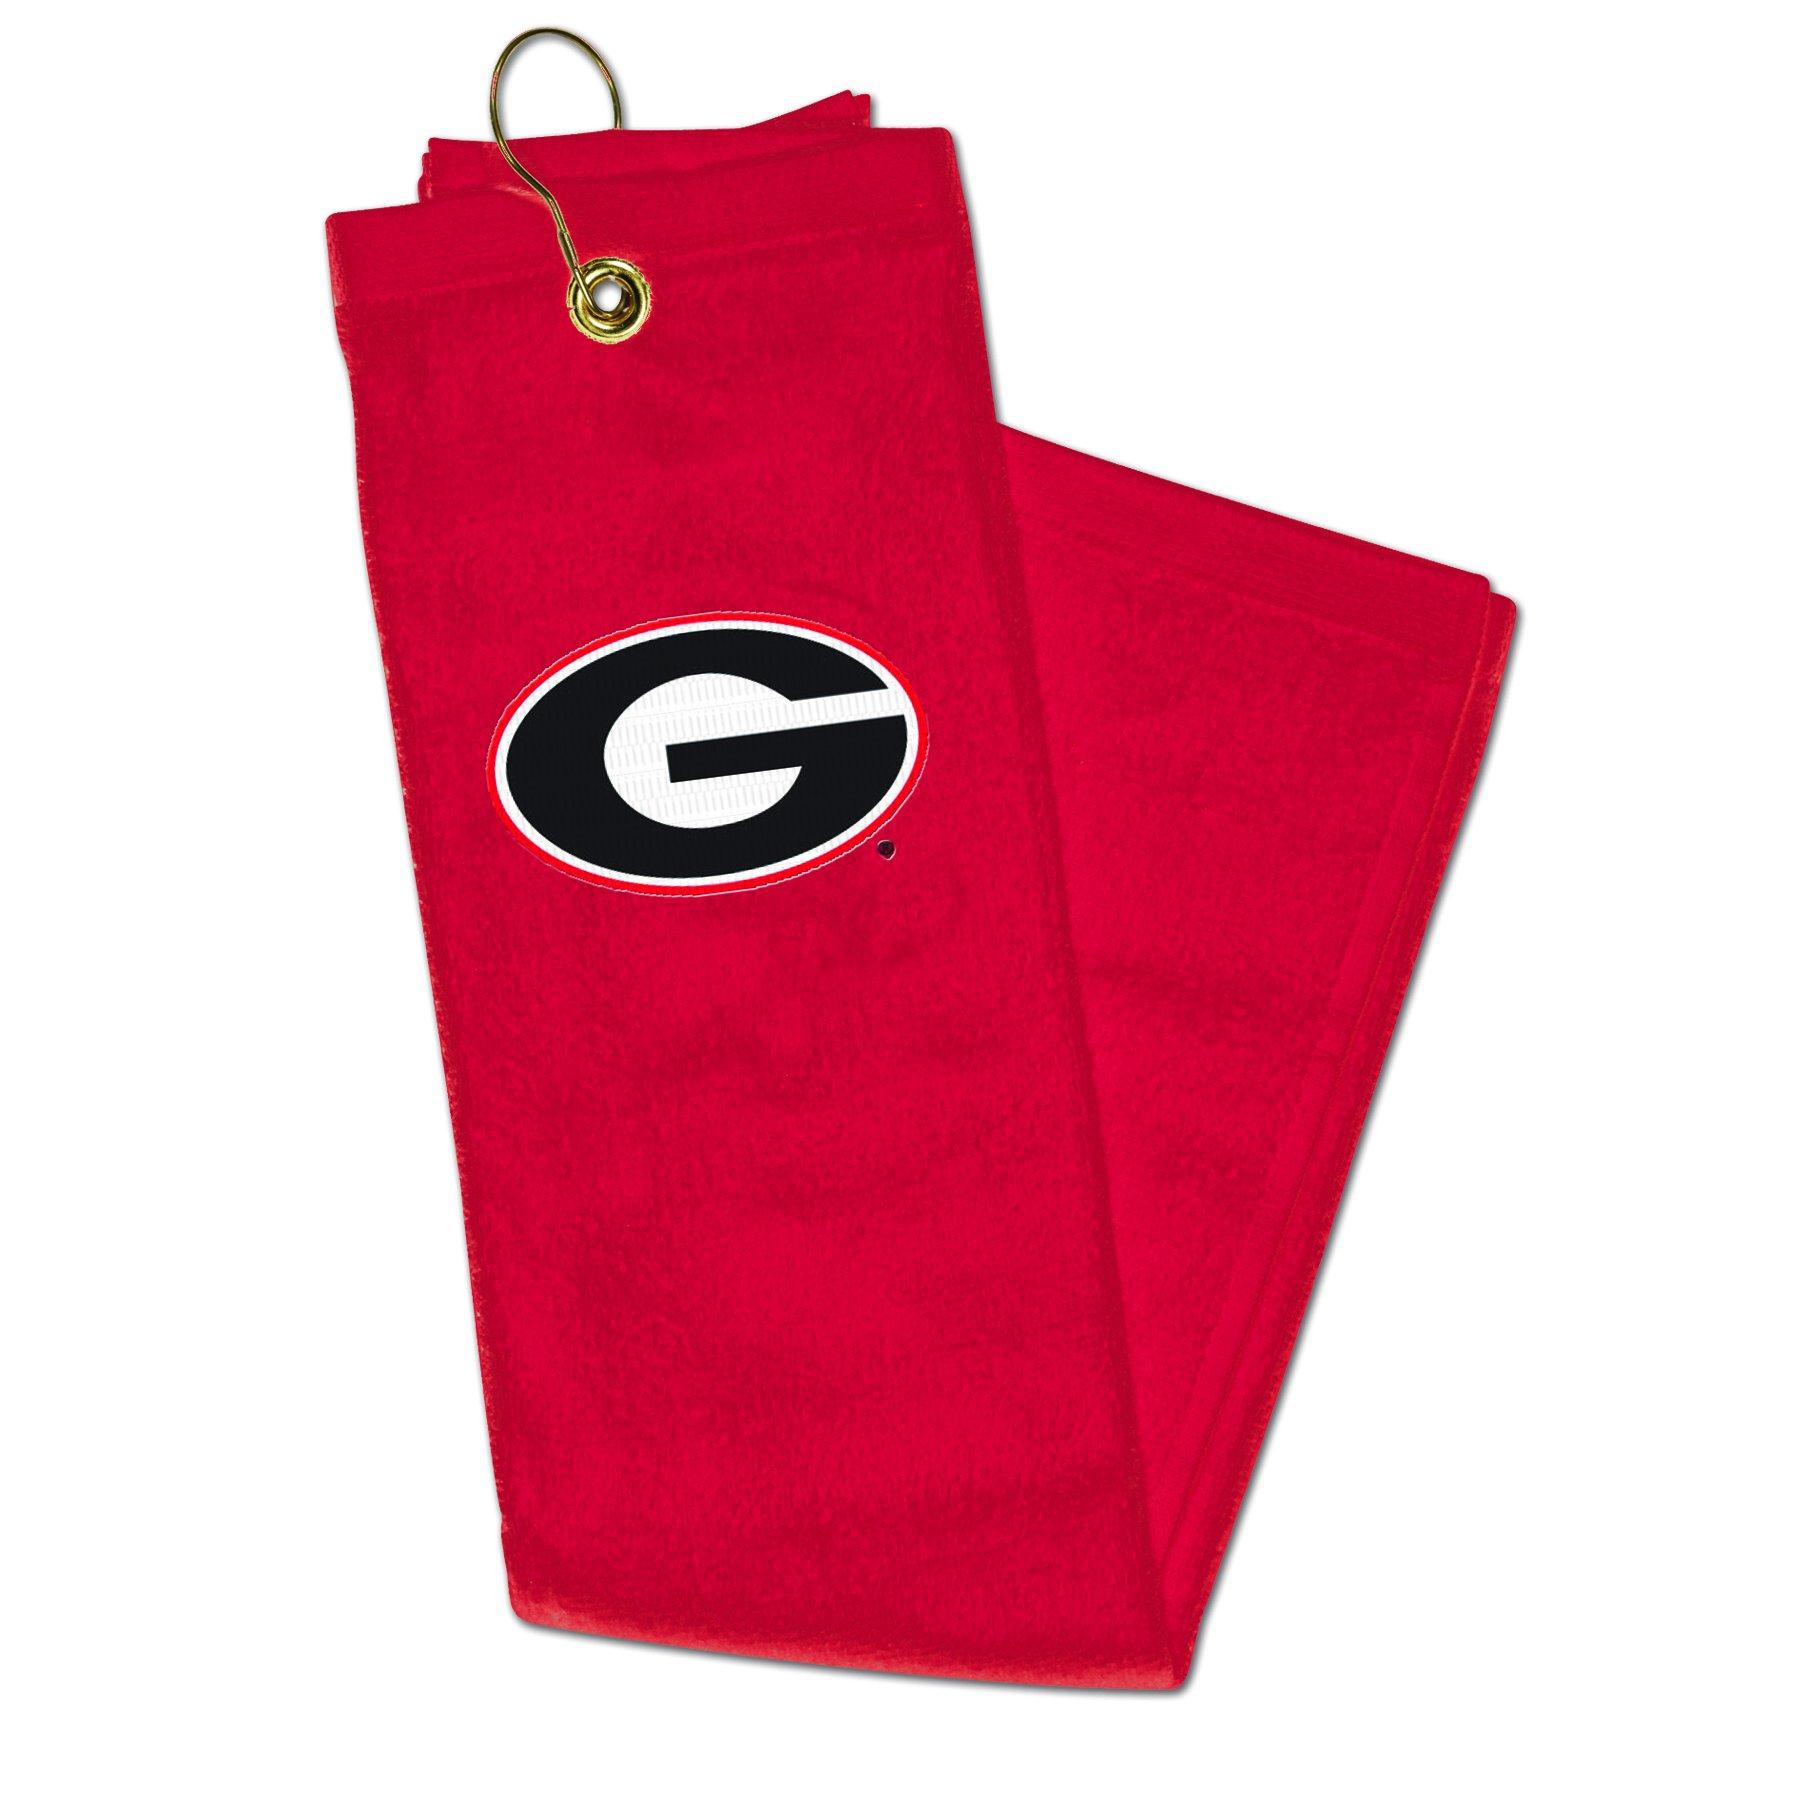 NCAA Georgia Bulldogs Embroidered Golf Towel, 15 x 25-Inch